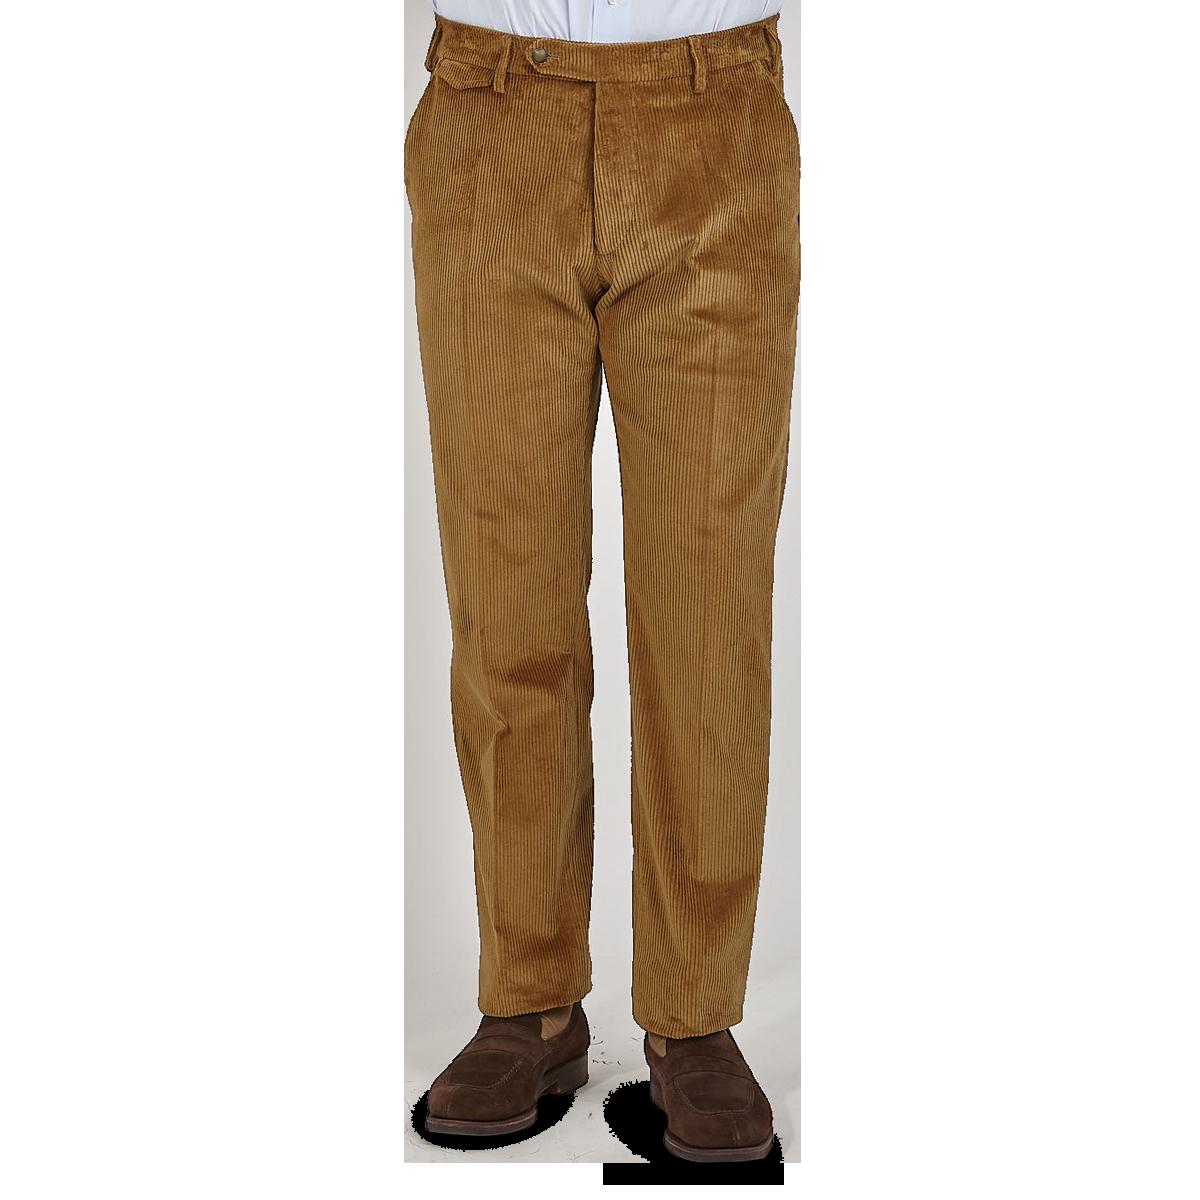 Berwich Light Brown Cotton Corduroy Flat Front Trousers Front